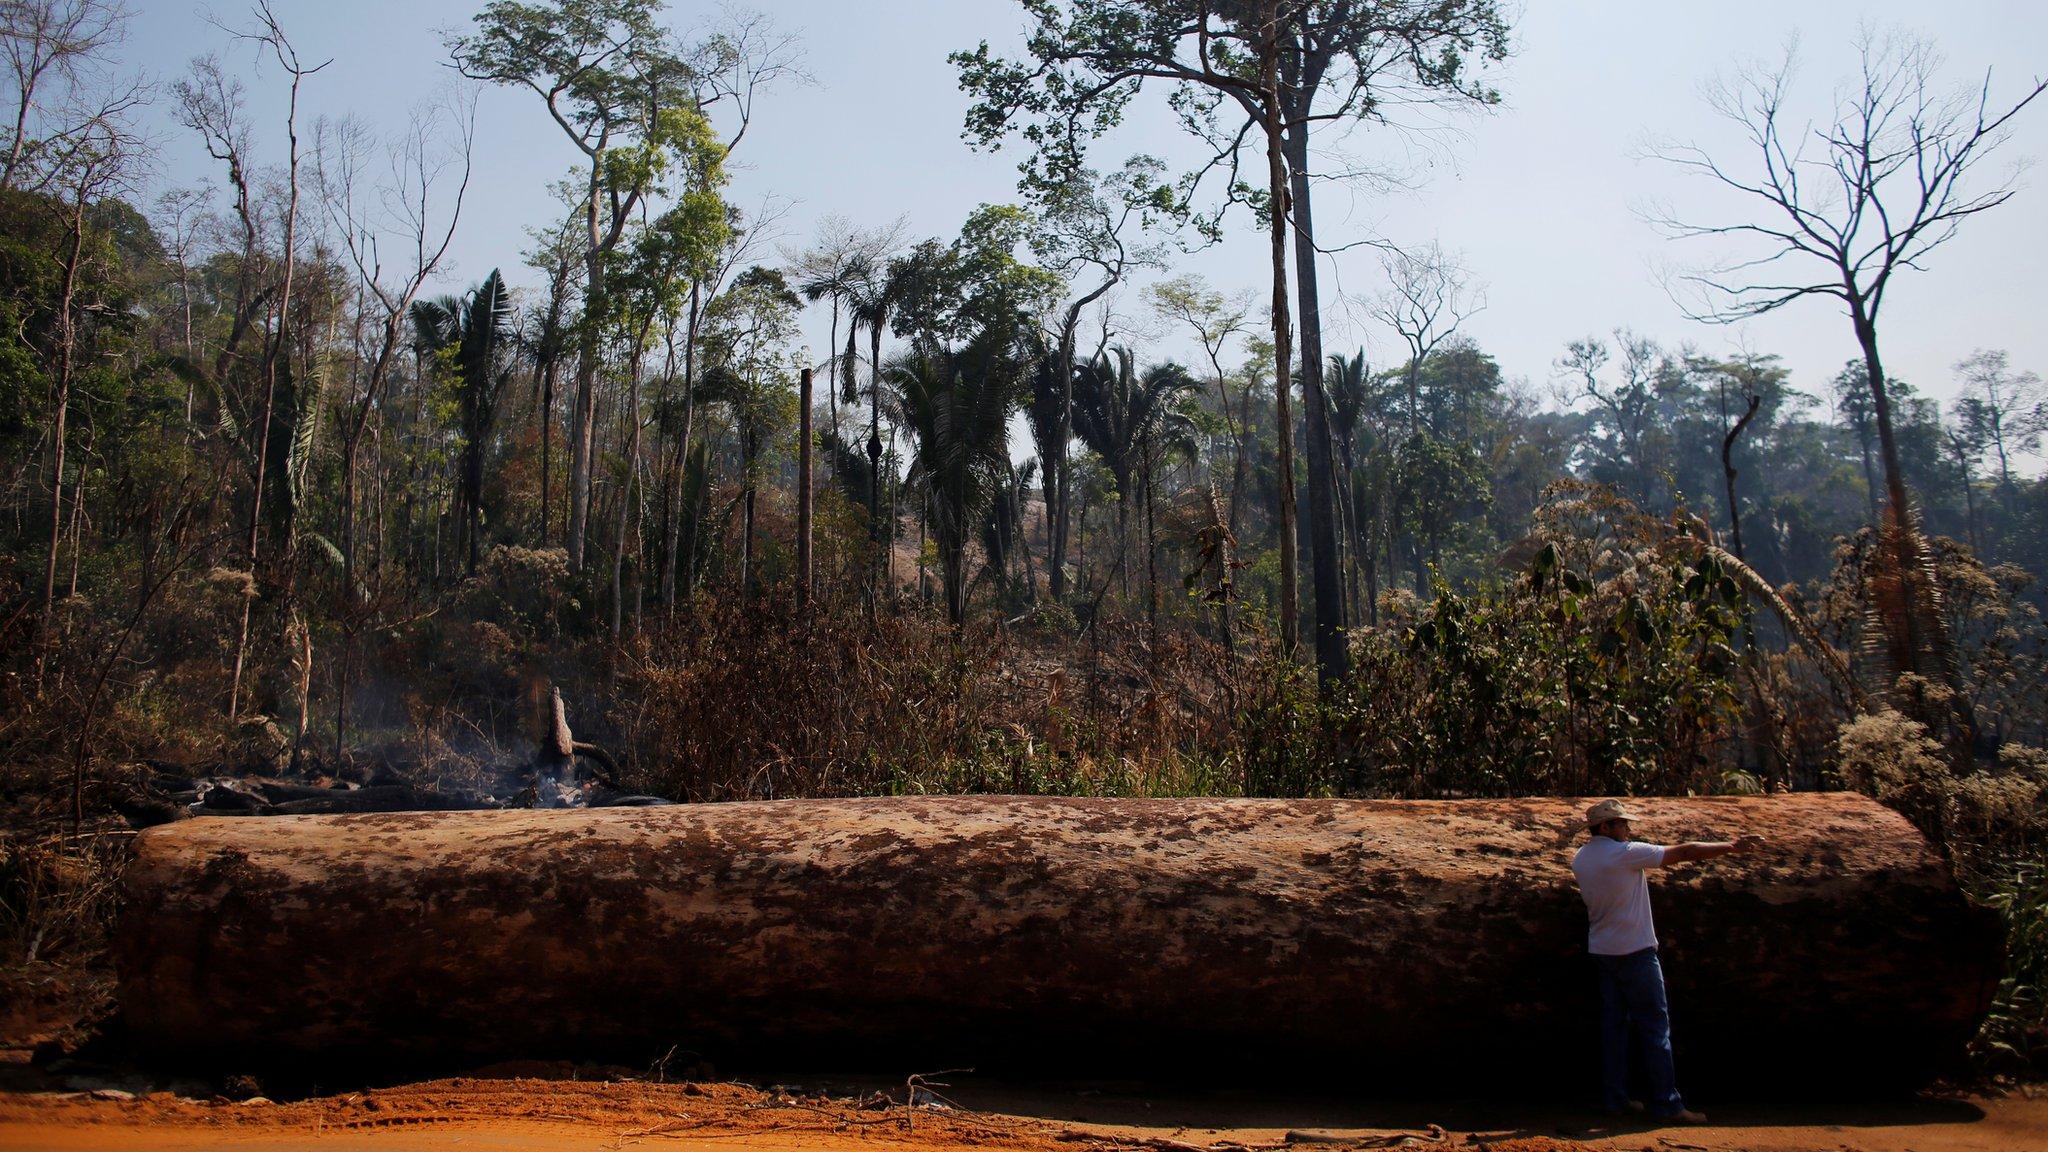 amazon rainforest location - HD2048×1152